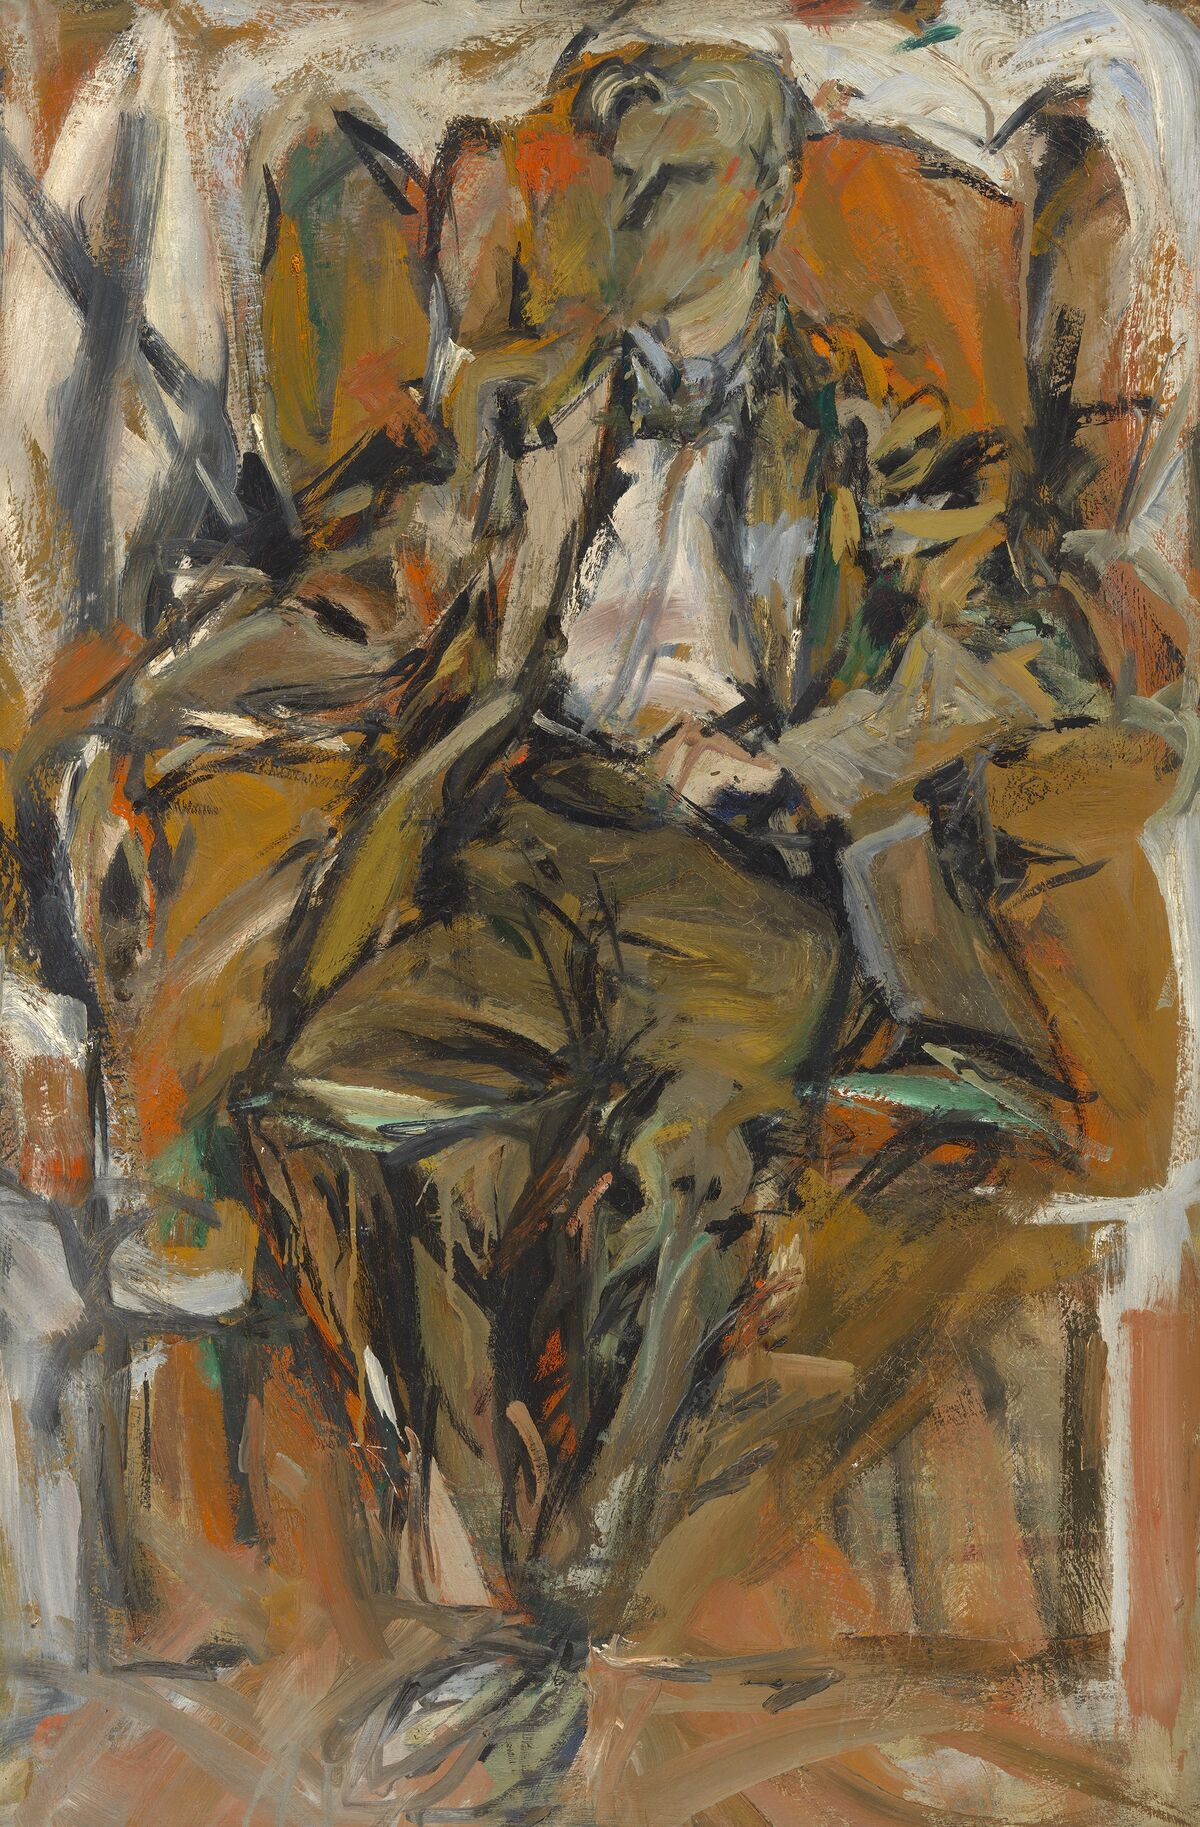 Elaine de Kooning, Willem de Kooning, c. 1952. © Elaine de Kooning Trust. Courtesy of the National Portrait Gallery, Smithsonian Institution.